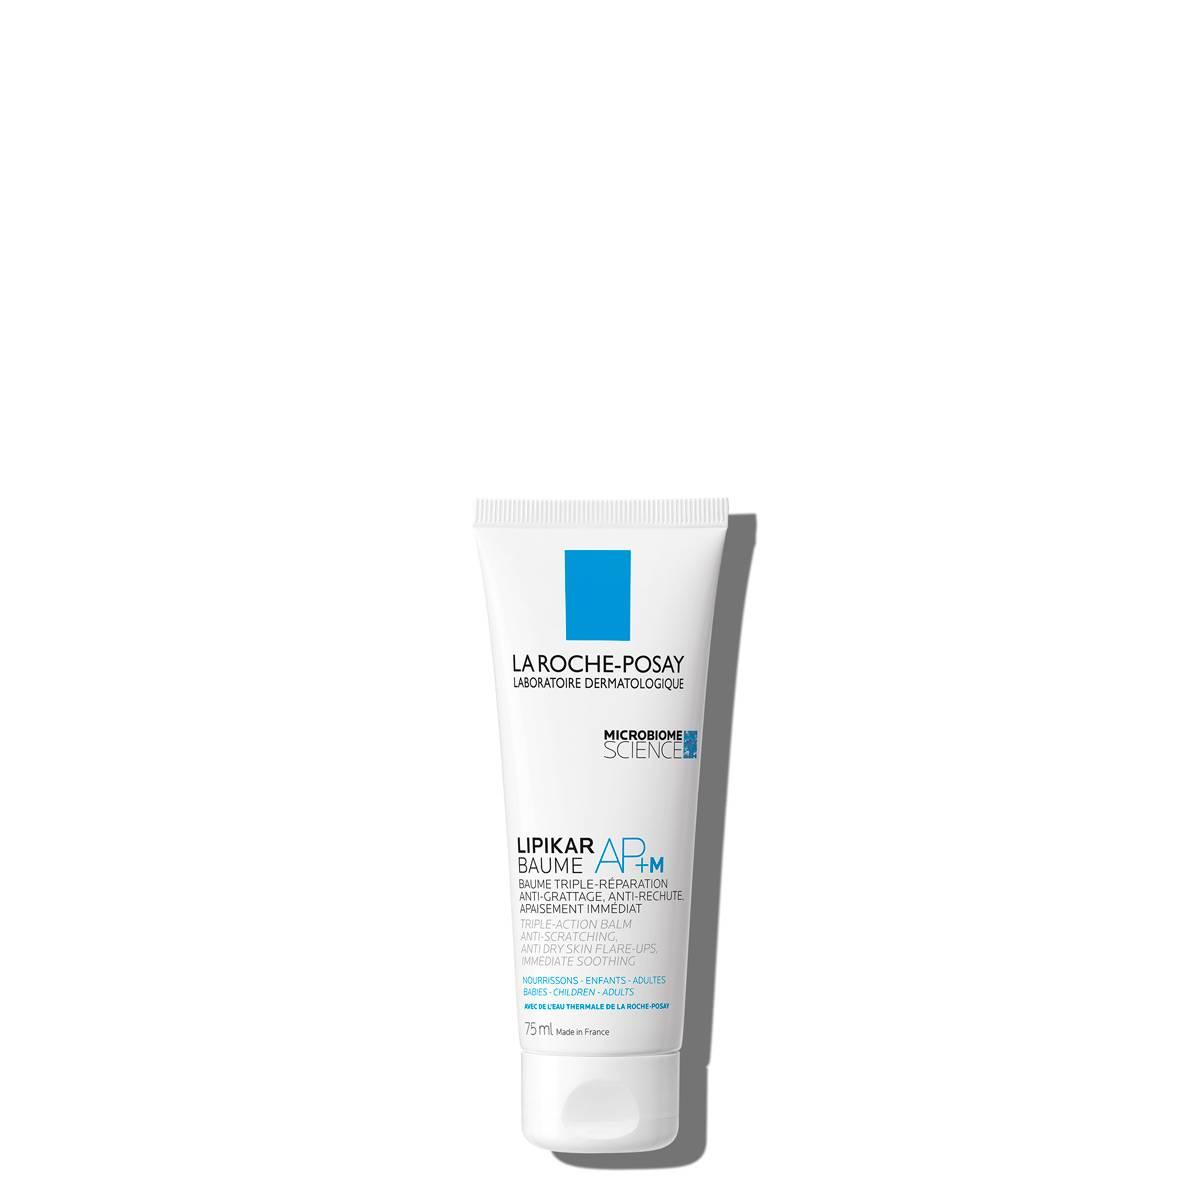 La Roche Posay Kroppspleie Lipikar Baume APM 75ml Lipid Replenishing Balm AntiIrritation Scratching 0003337872421037